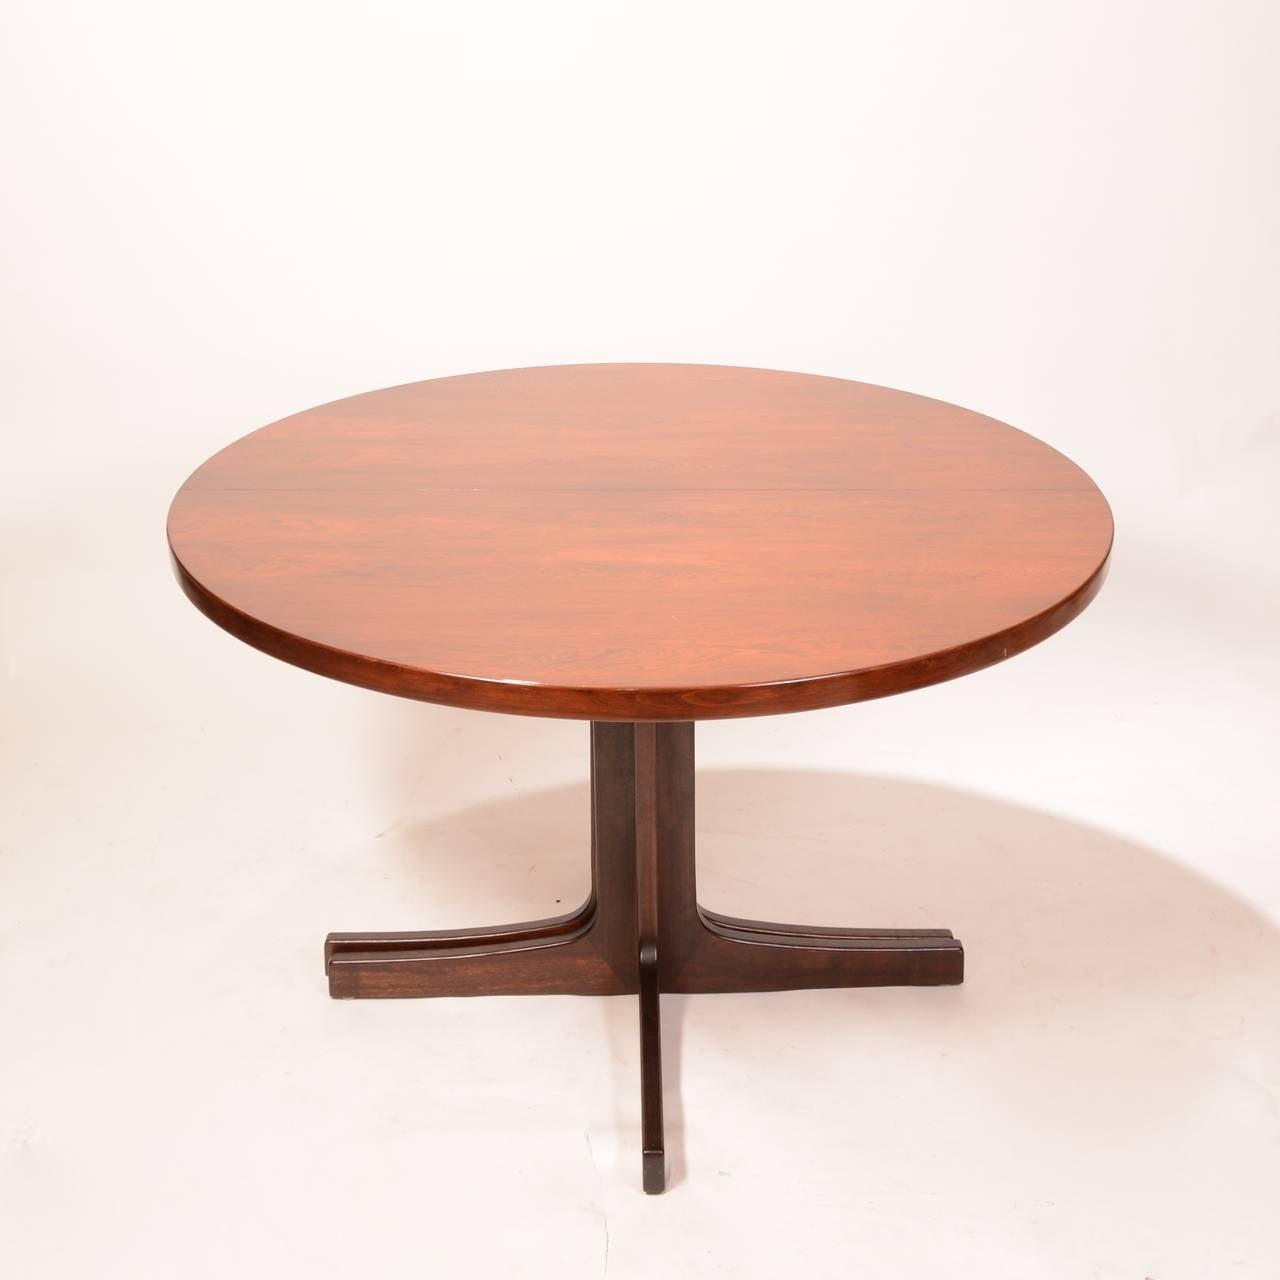 Mid-Century Modern Skovmand & Andersen for Moreddi Rosewood Dining Table 2